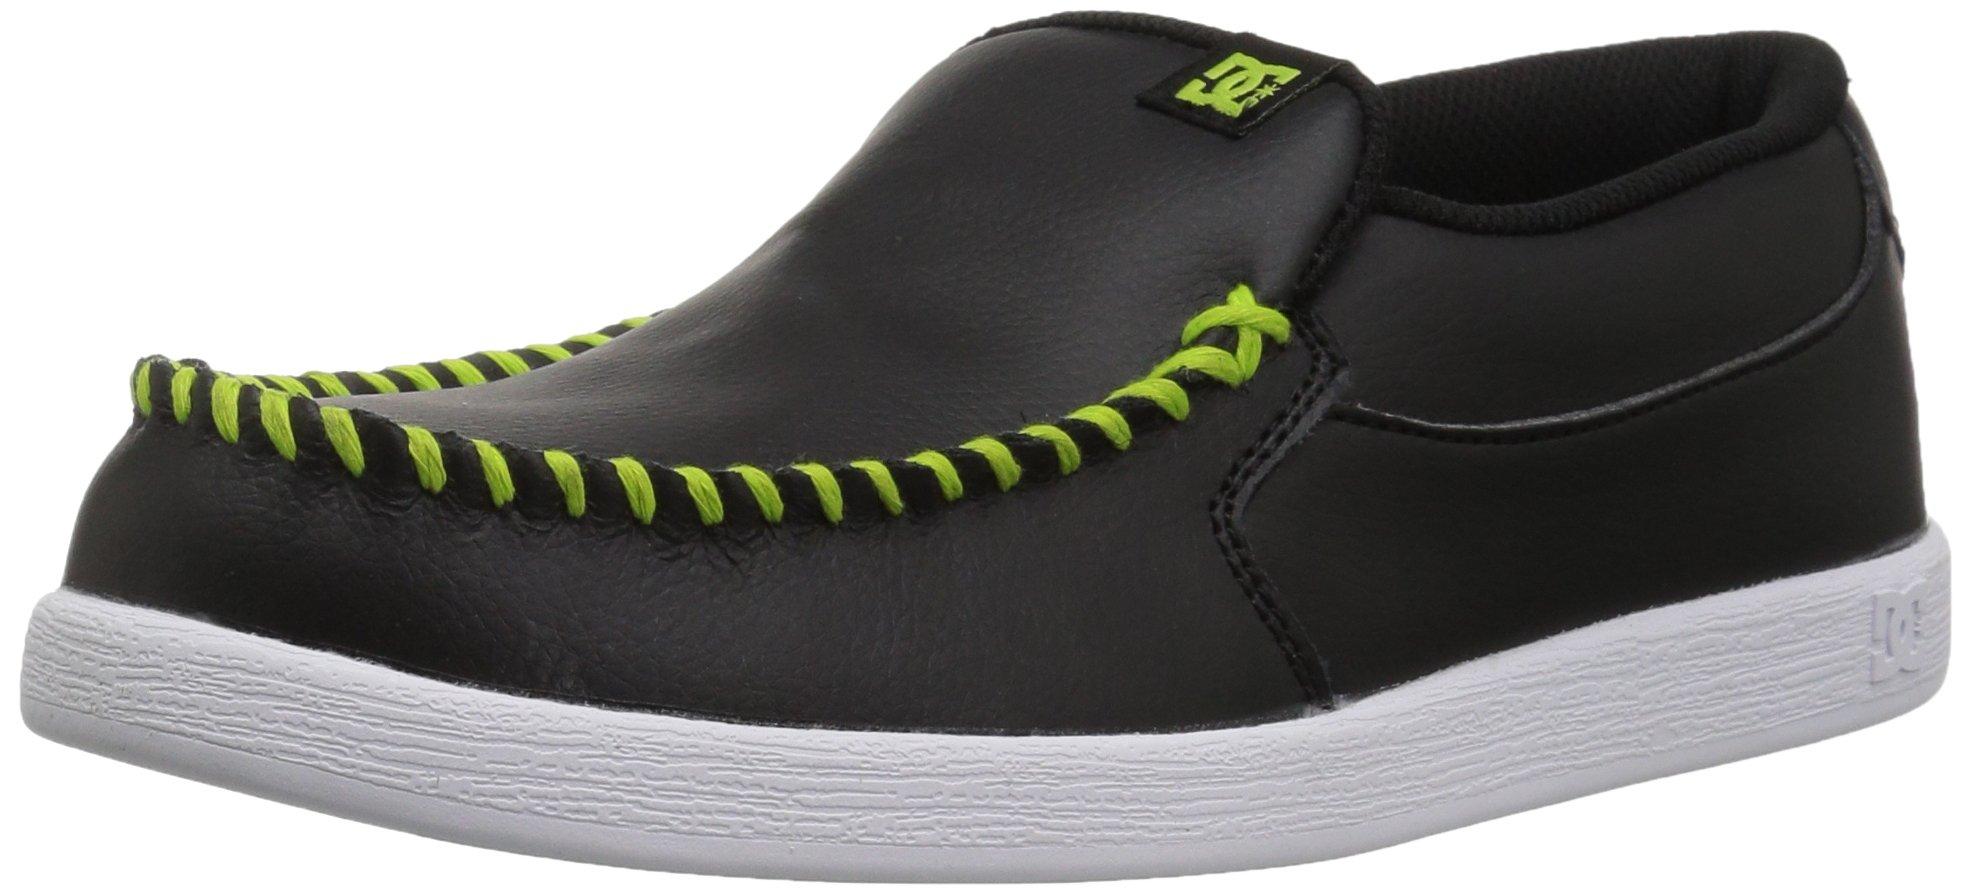 DC Boys' Villain Skate Shoe, Black/Green, 6 M US Big Kid